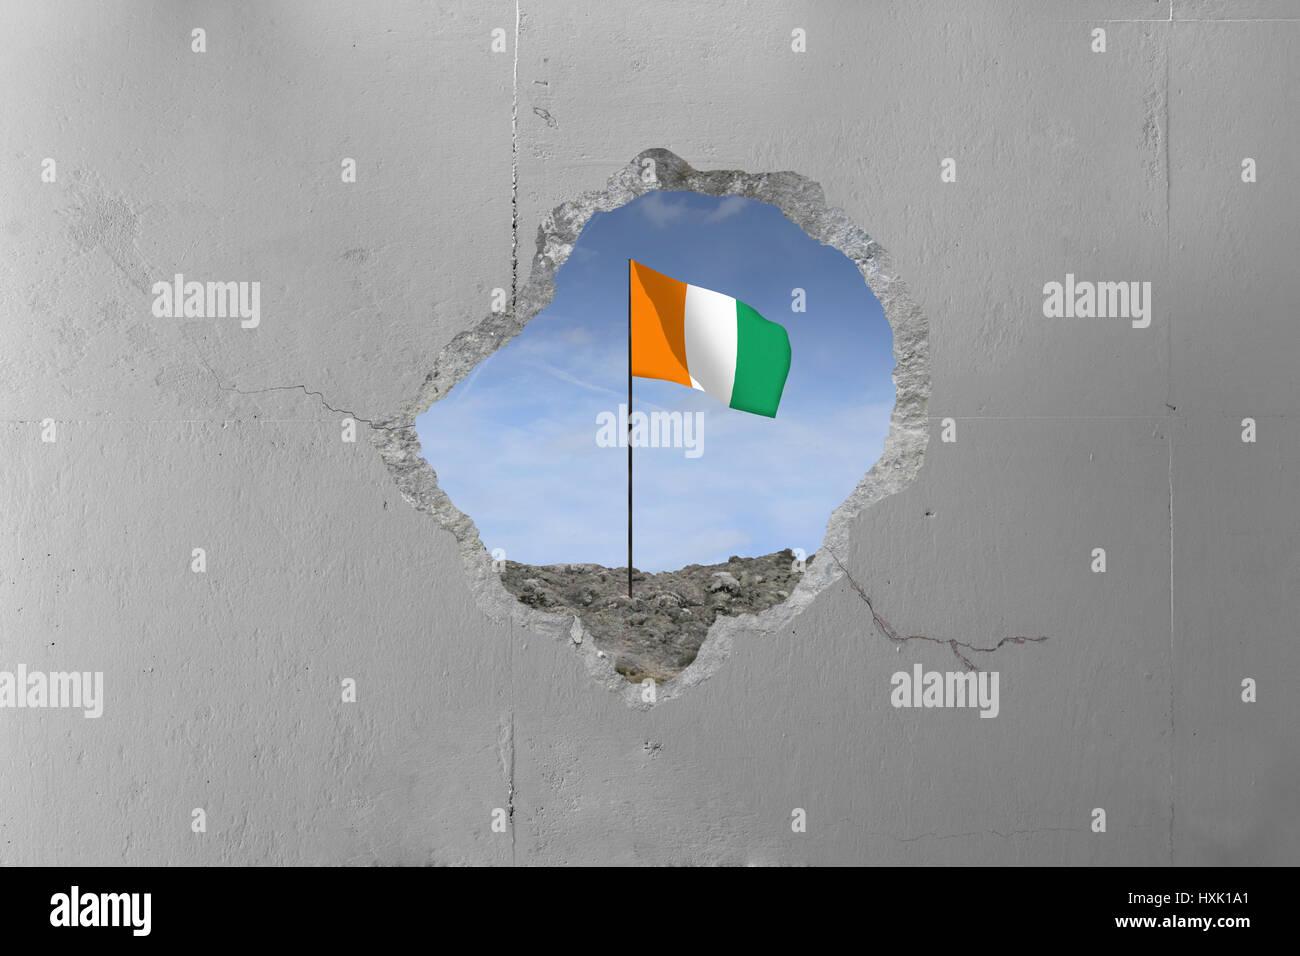 Cote d'Ivoire flag behind a concrete wall. - Stock Image